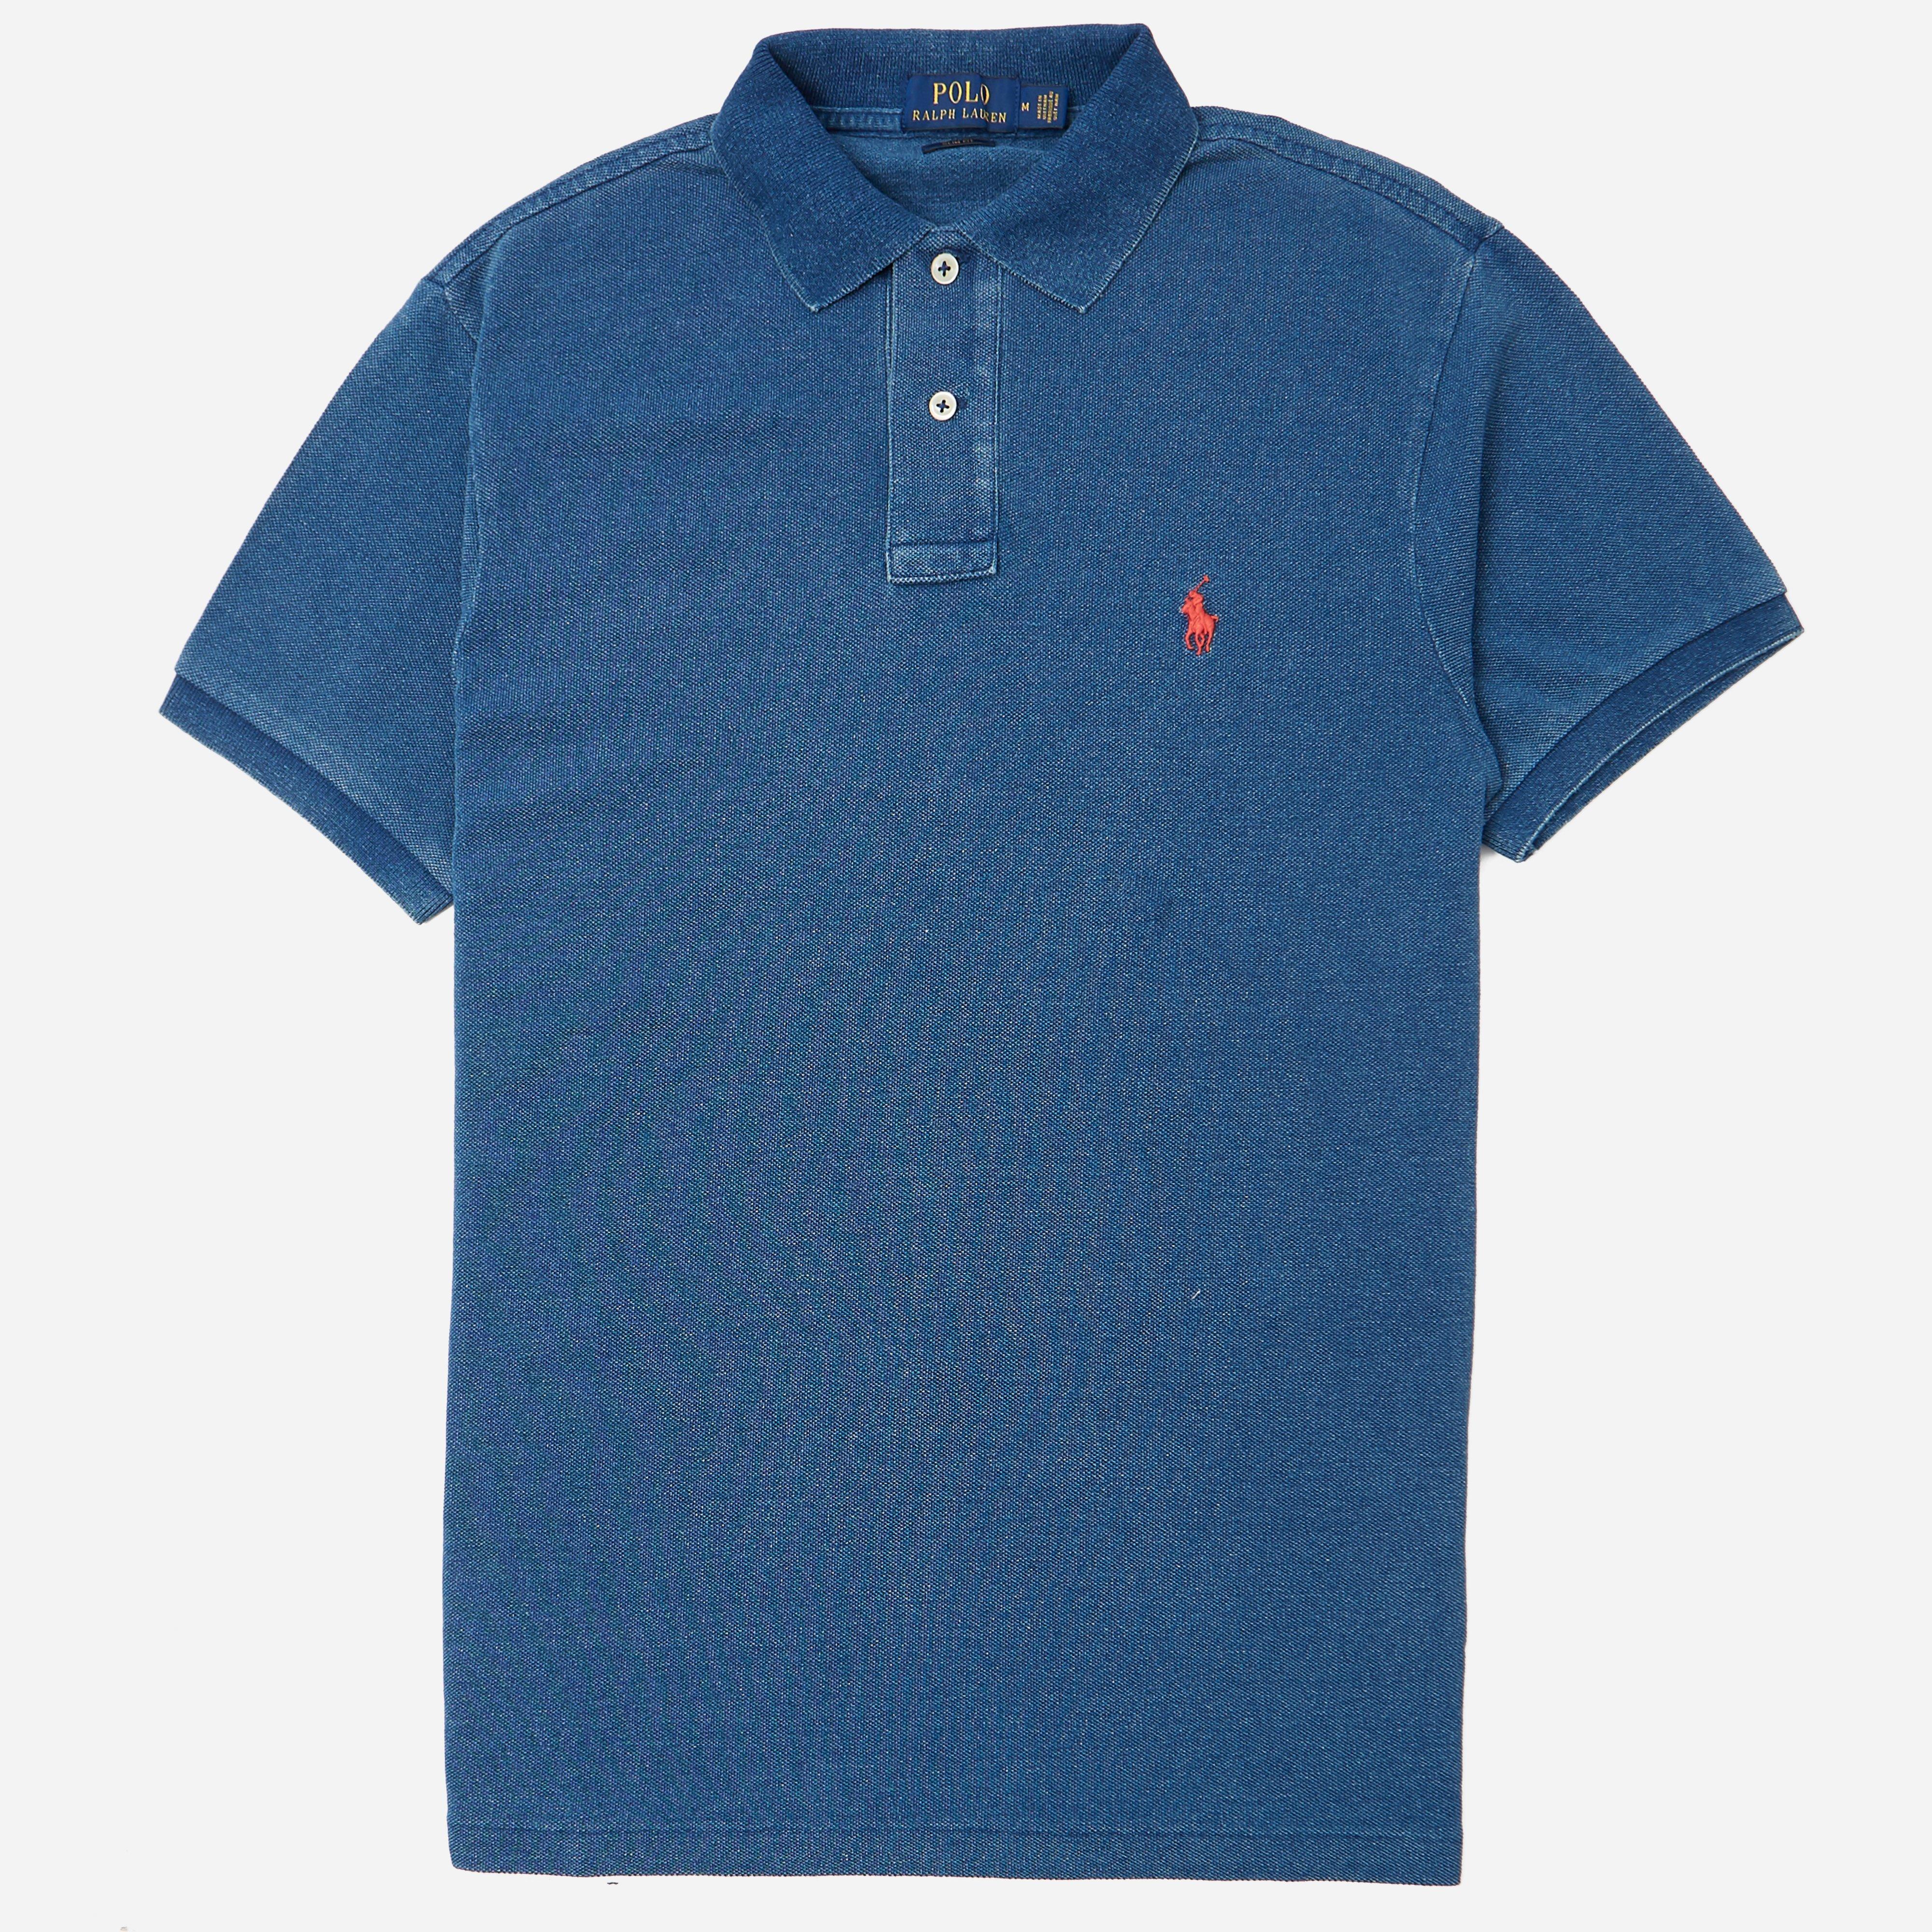 Polo Ralph Lauren Mesh Knitted Polo Shirt